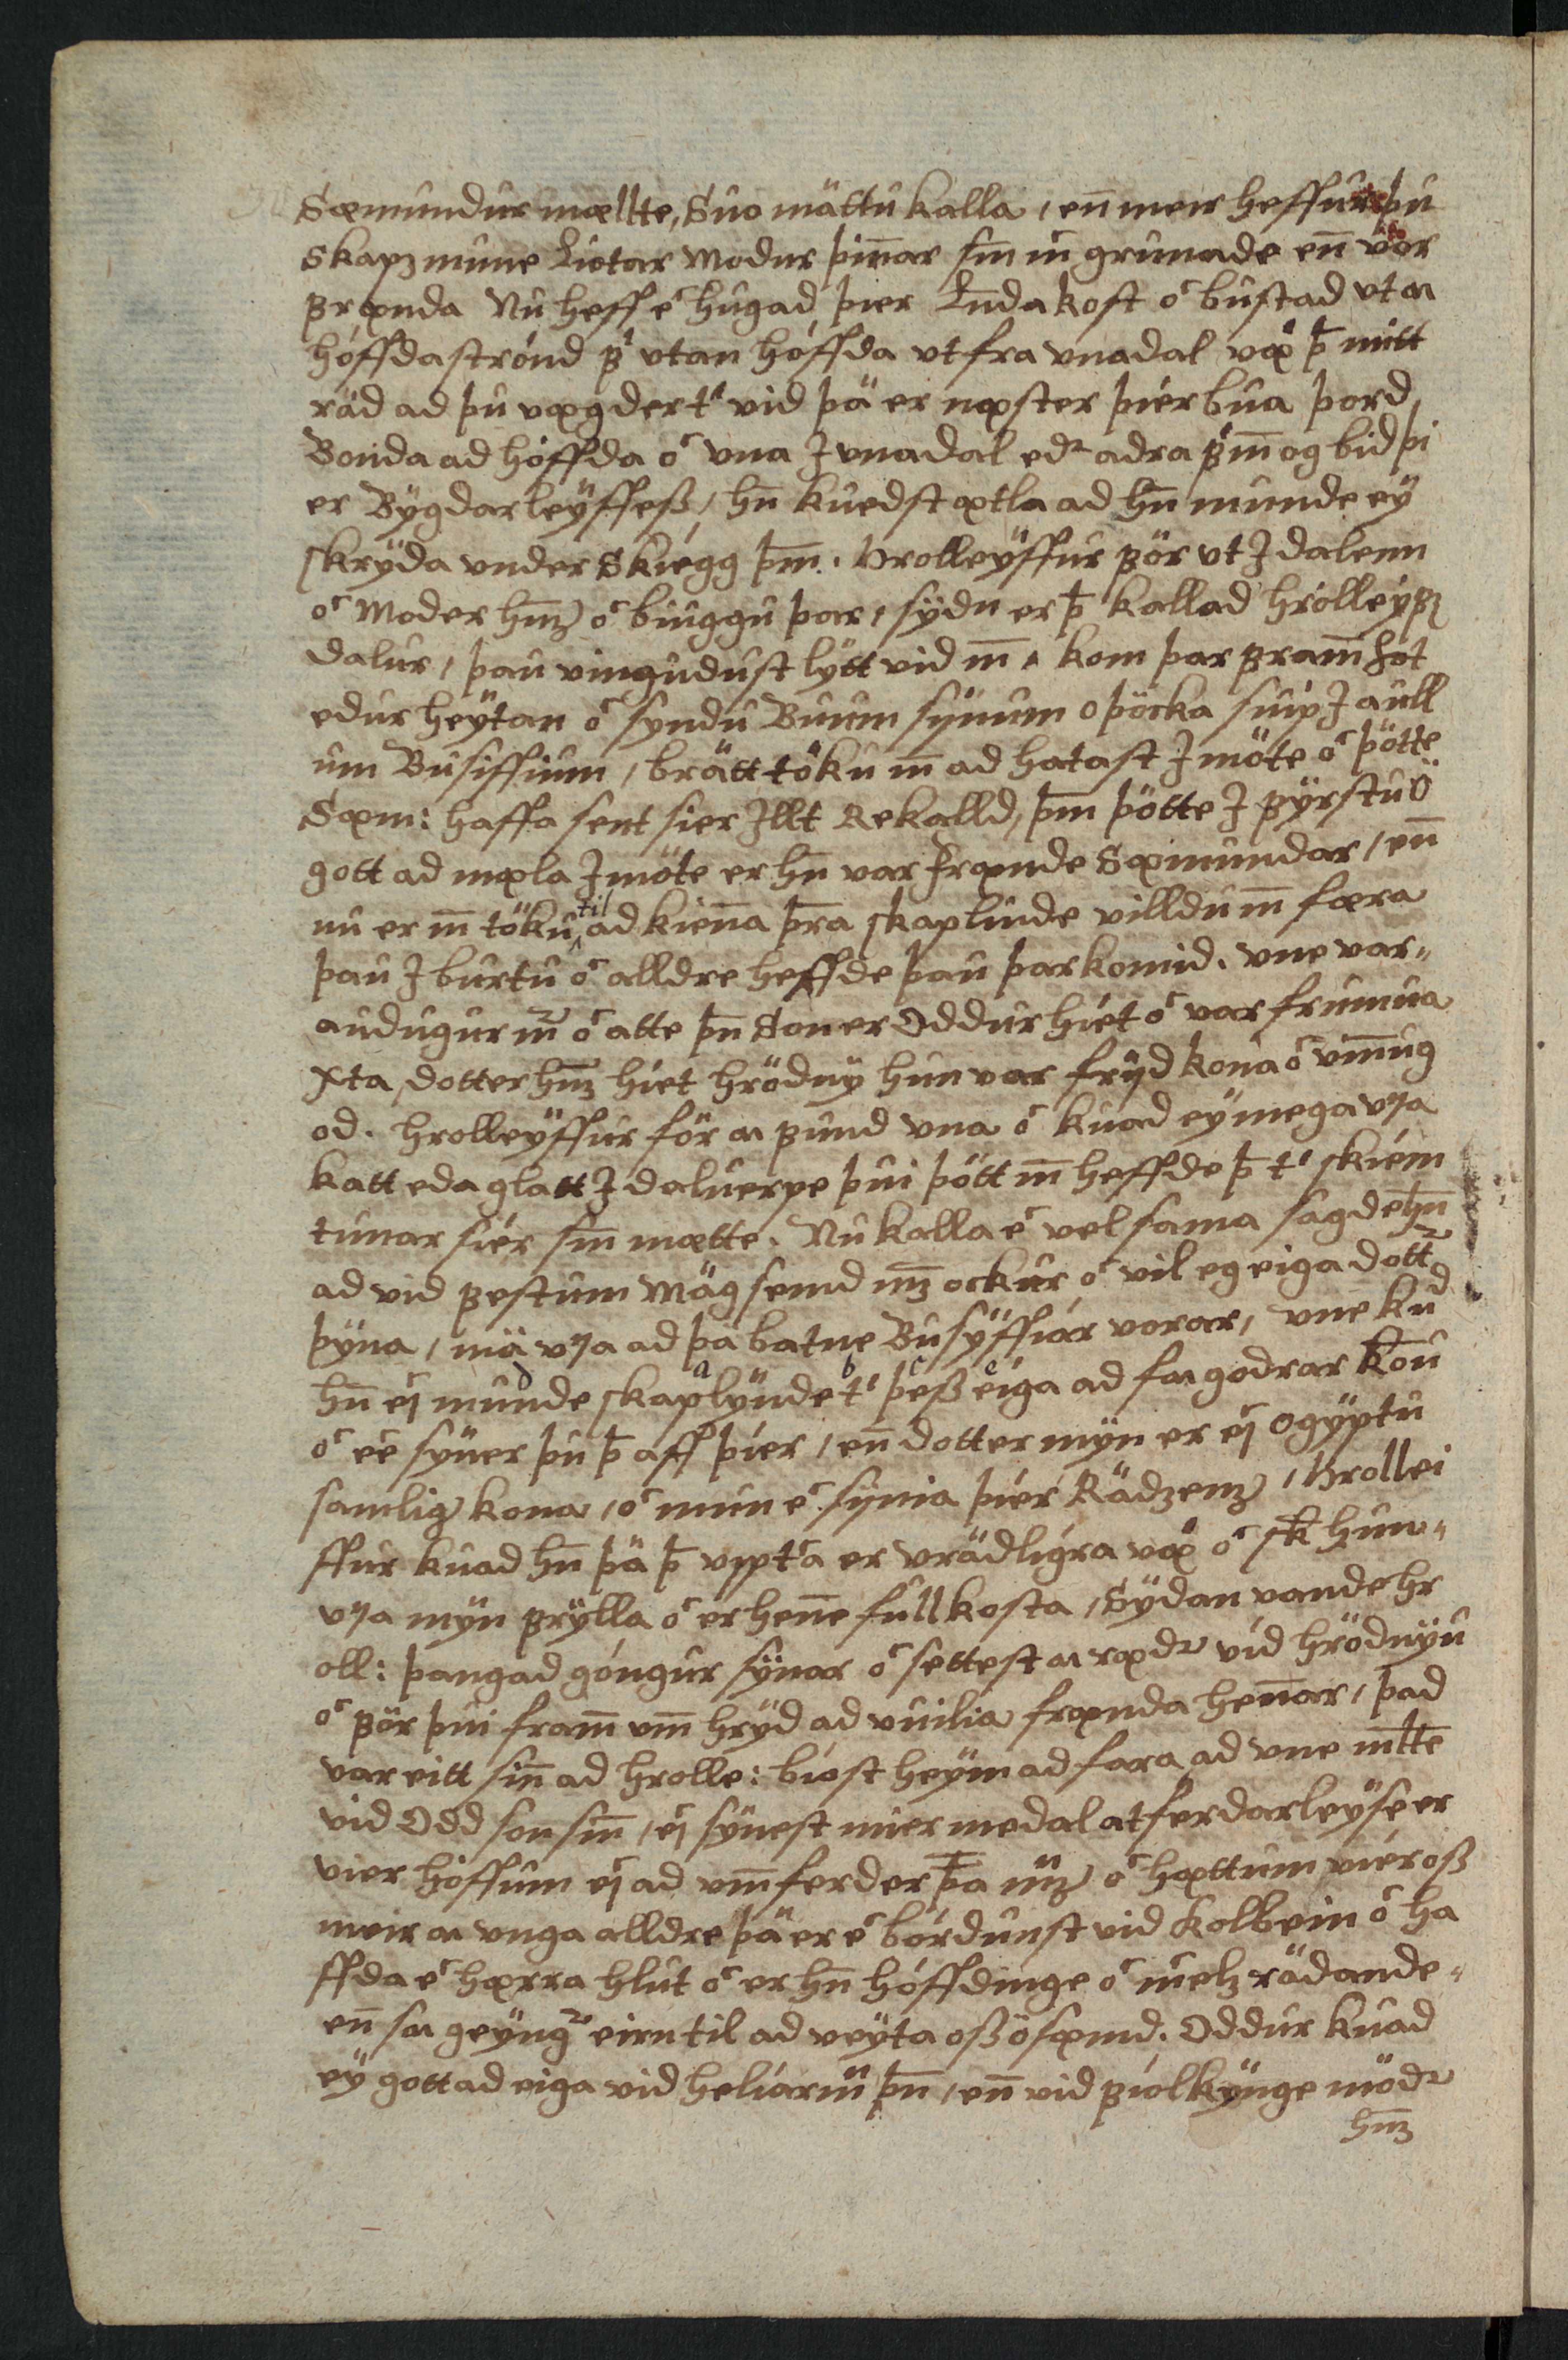 AM 138 fol - 15v